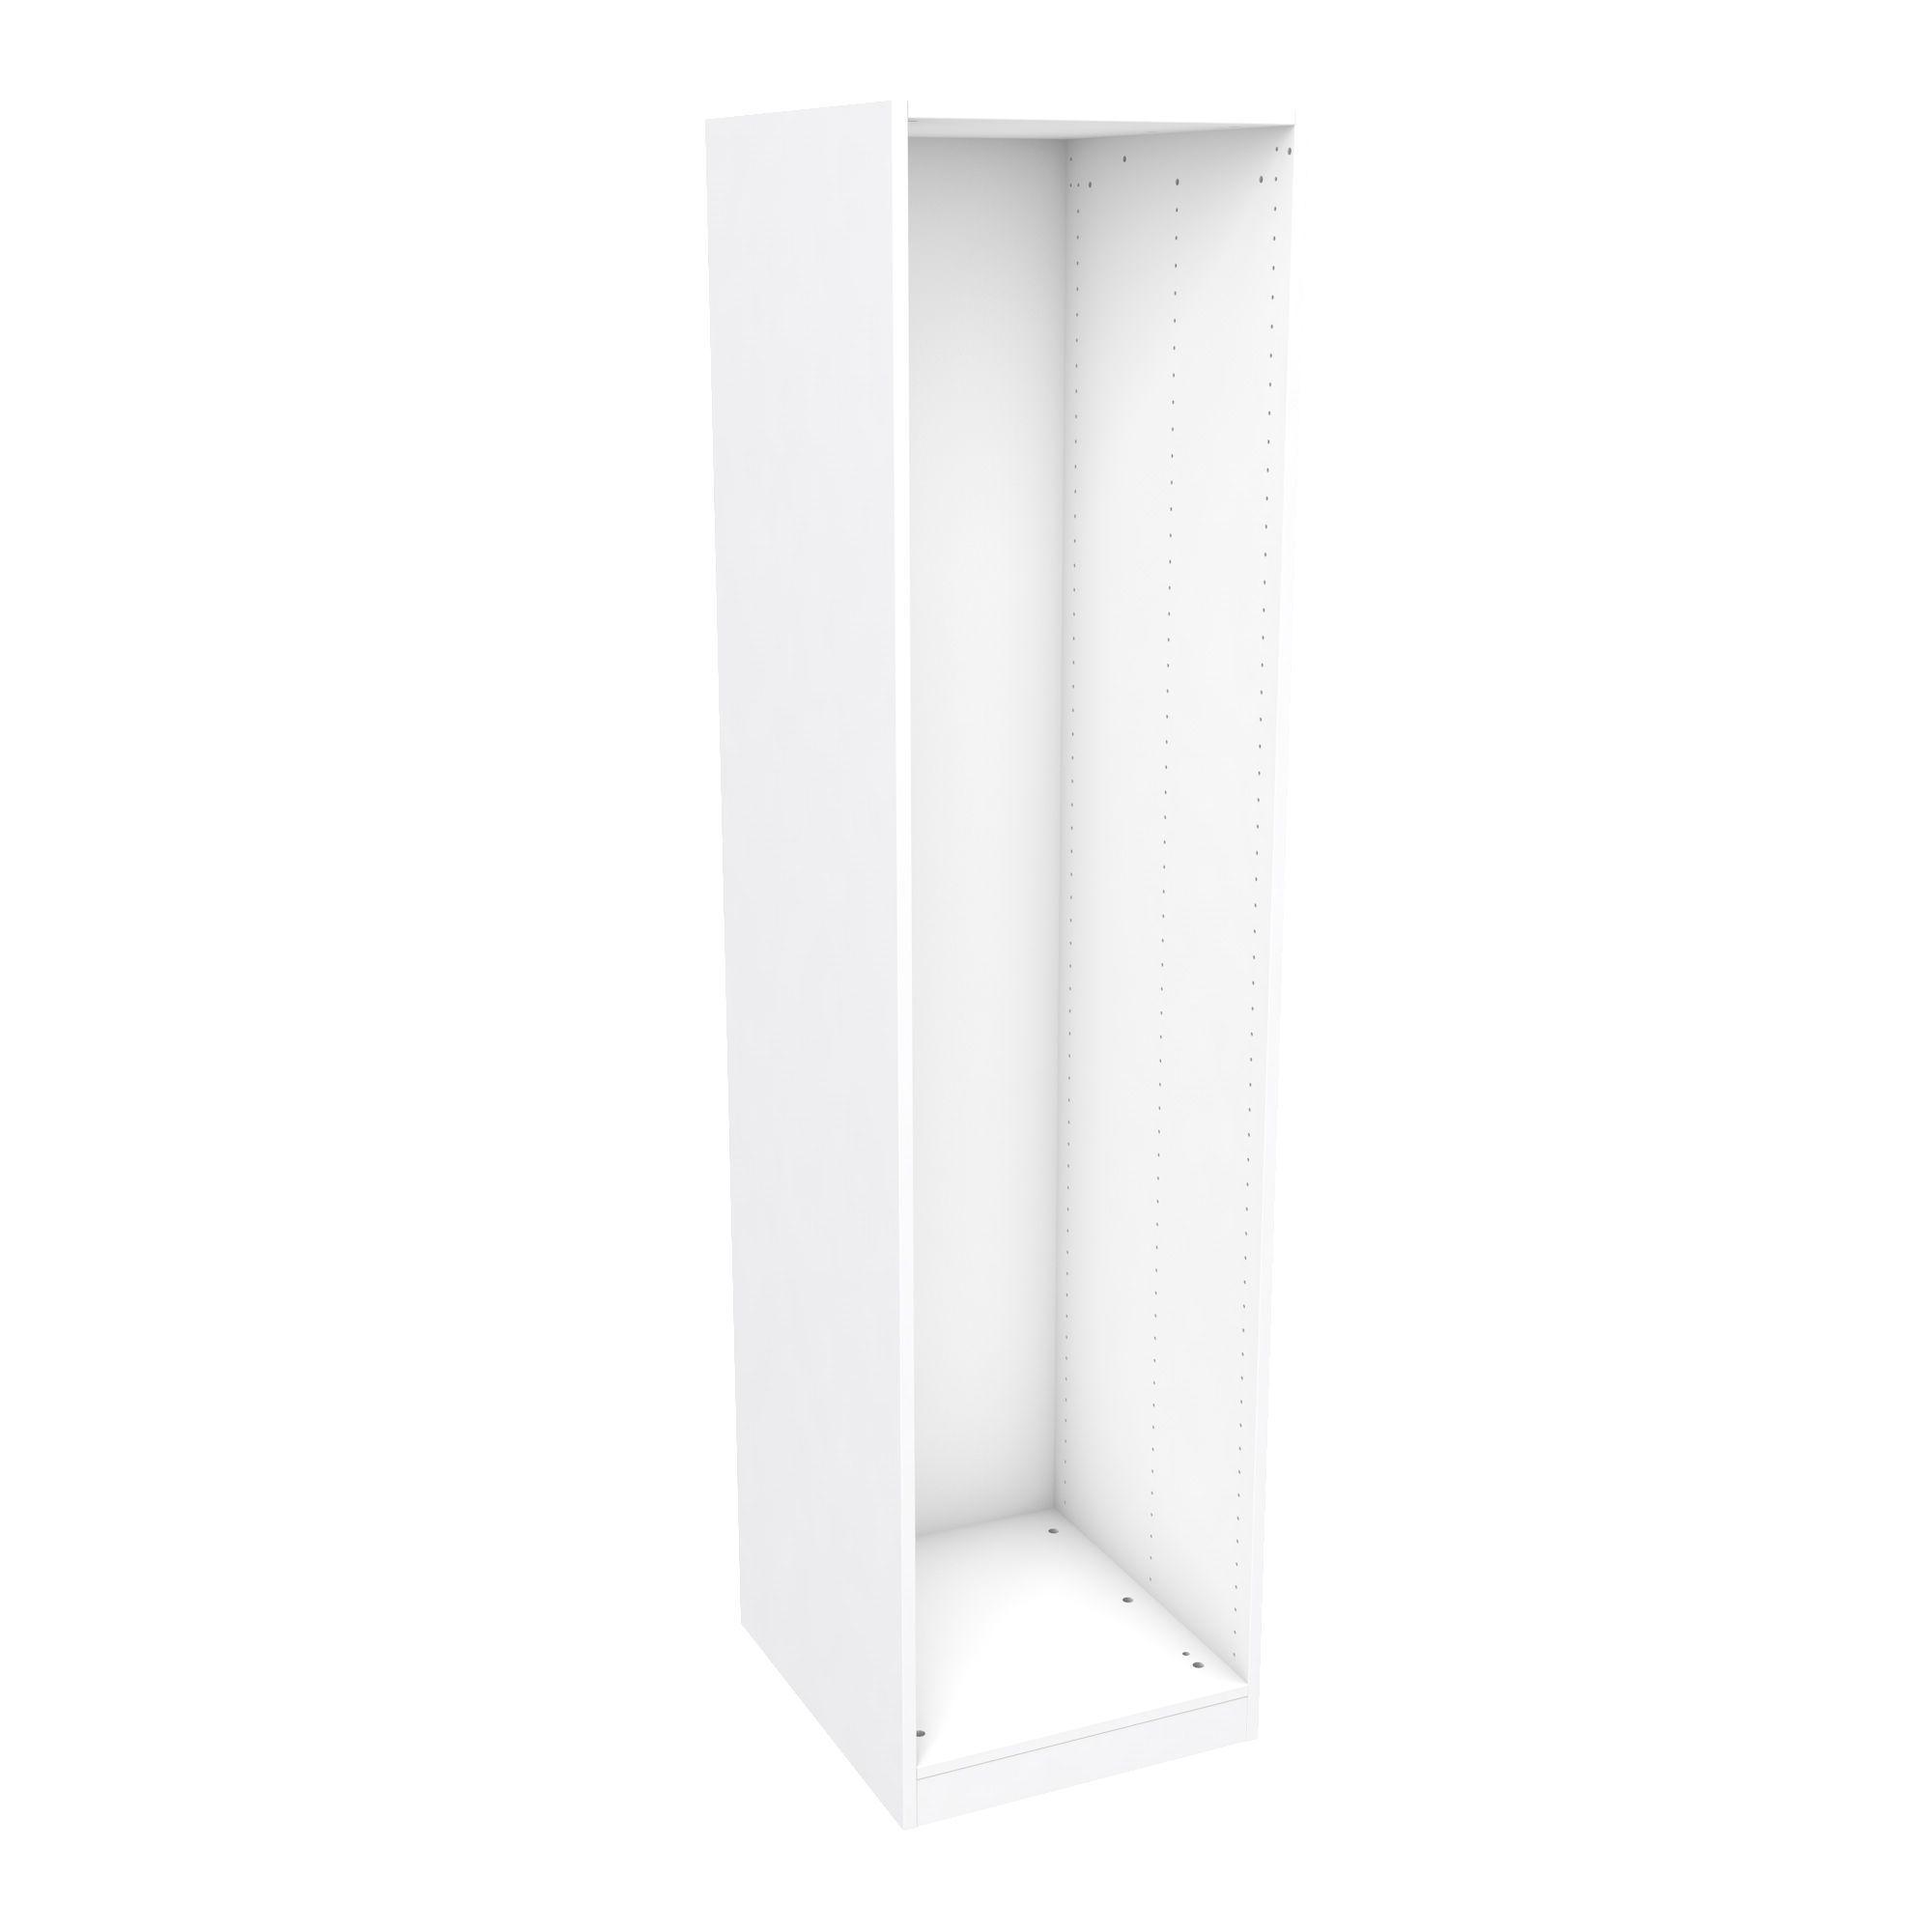 Darwin Modular White Wardrobe Cabinet (h)2004mm (w)500mm (d)566mm